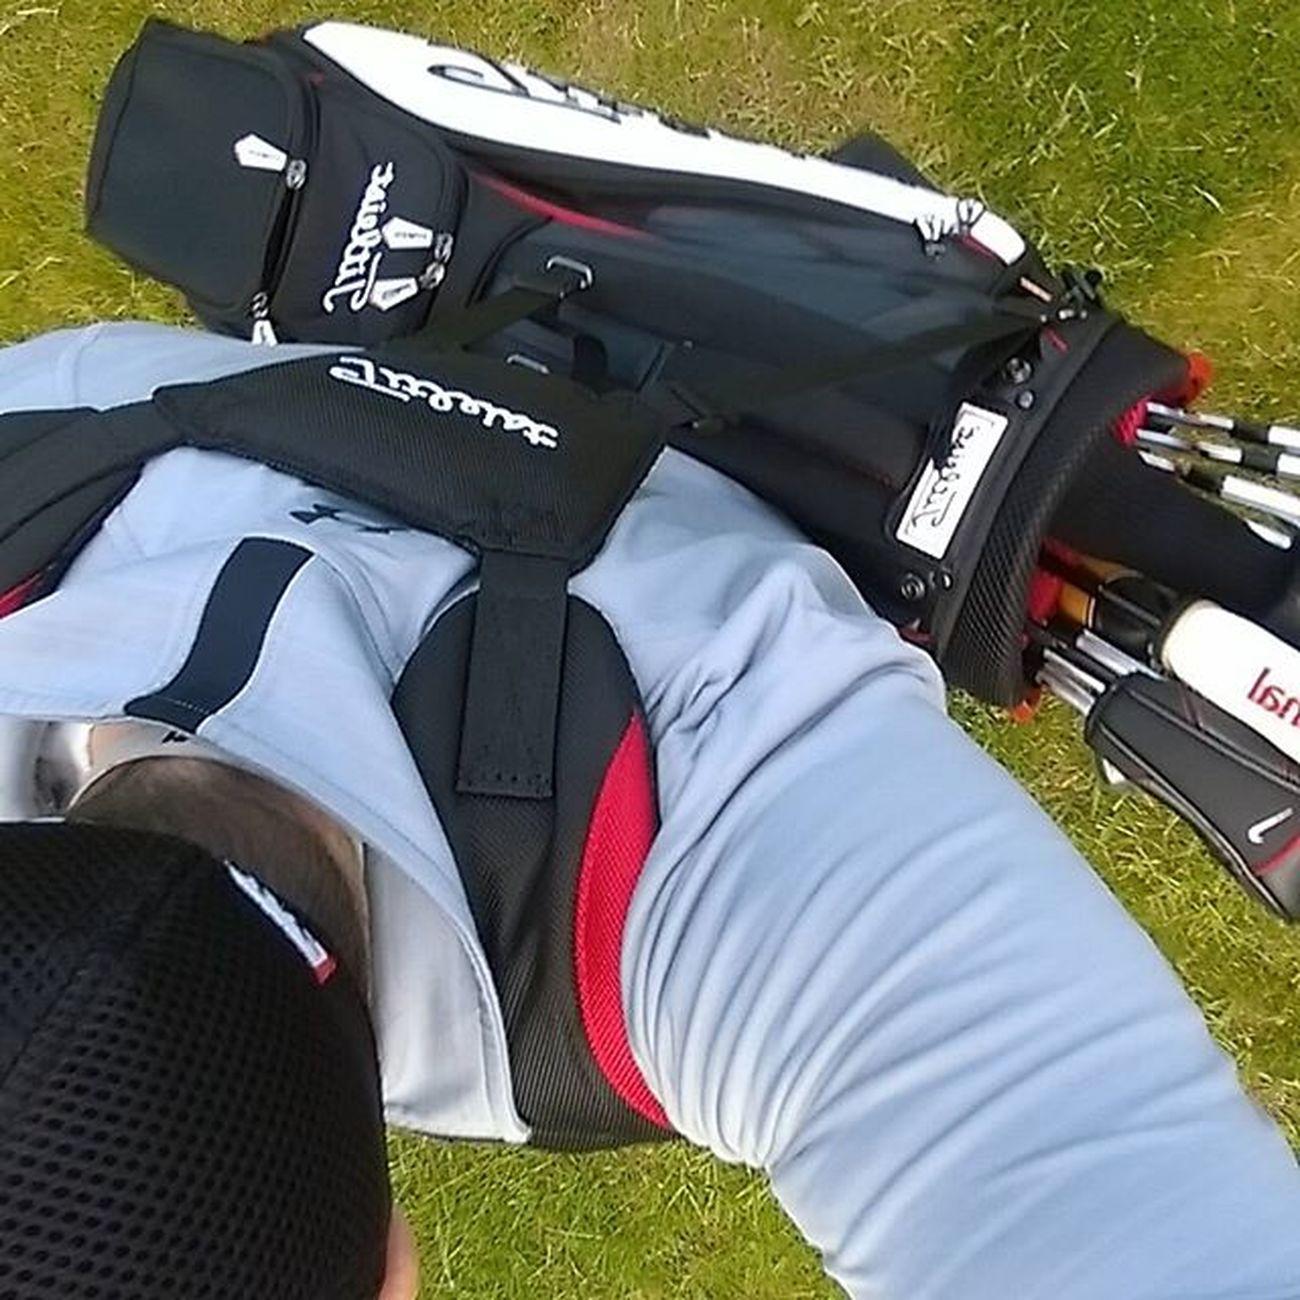 Carry your own bag. Titleist Titleistgolf UnderArmour Carry Golf Golfie Golfing Golfbag Golfjunkie Nikegolf Carryyourownbag